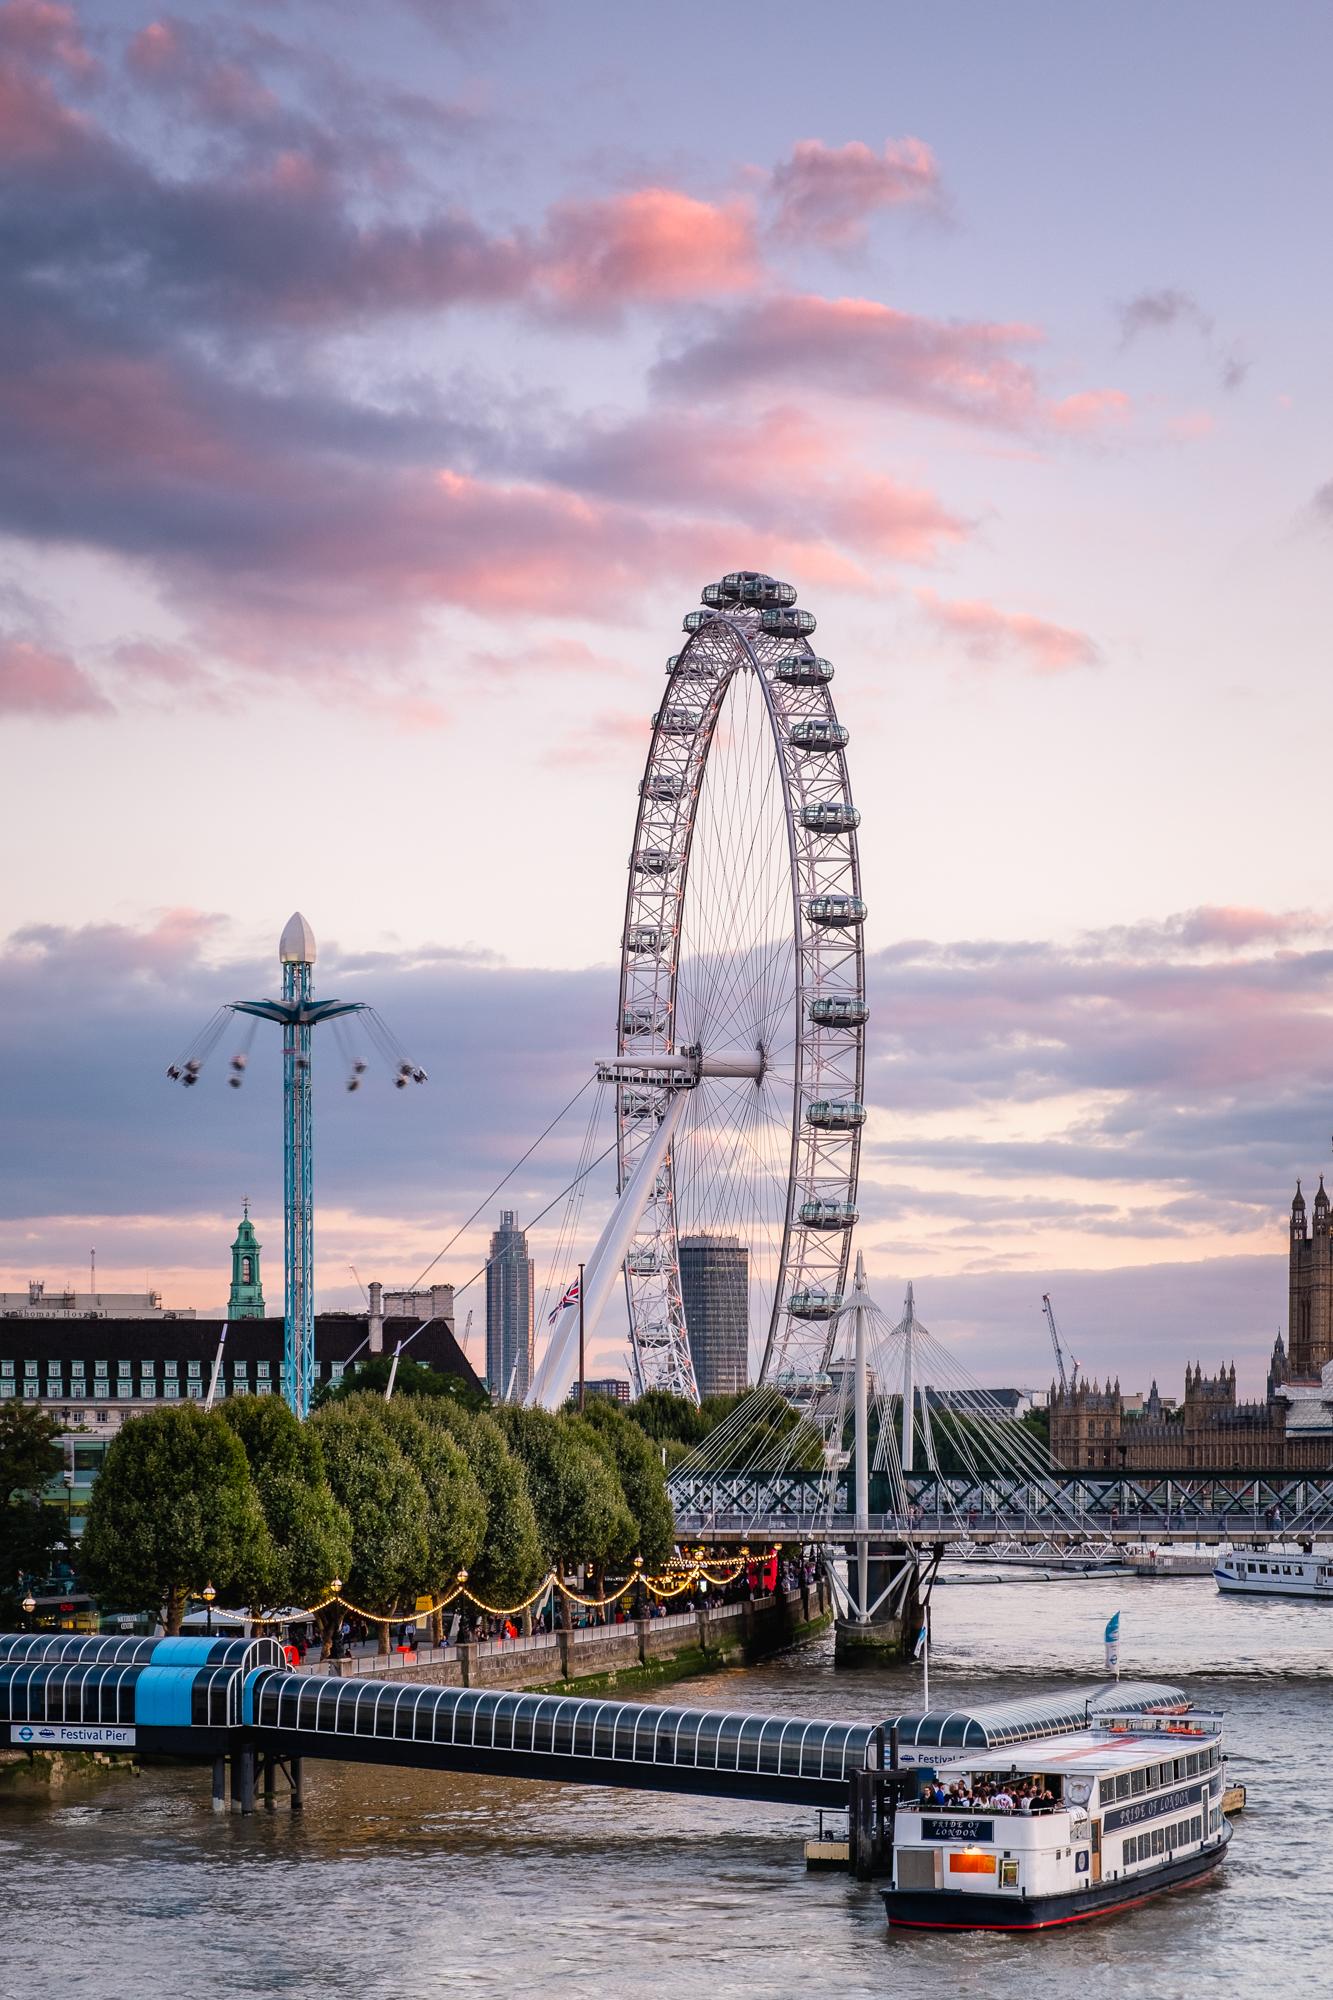 The London Eye | Fujifilm XT2 | XF18-55mm | 46mm | 1/12th Second | f/7.1 | ISO200